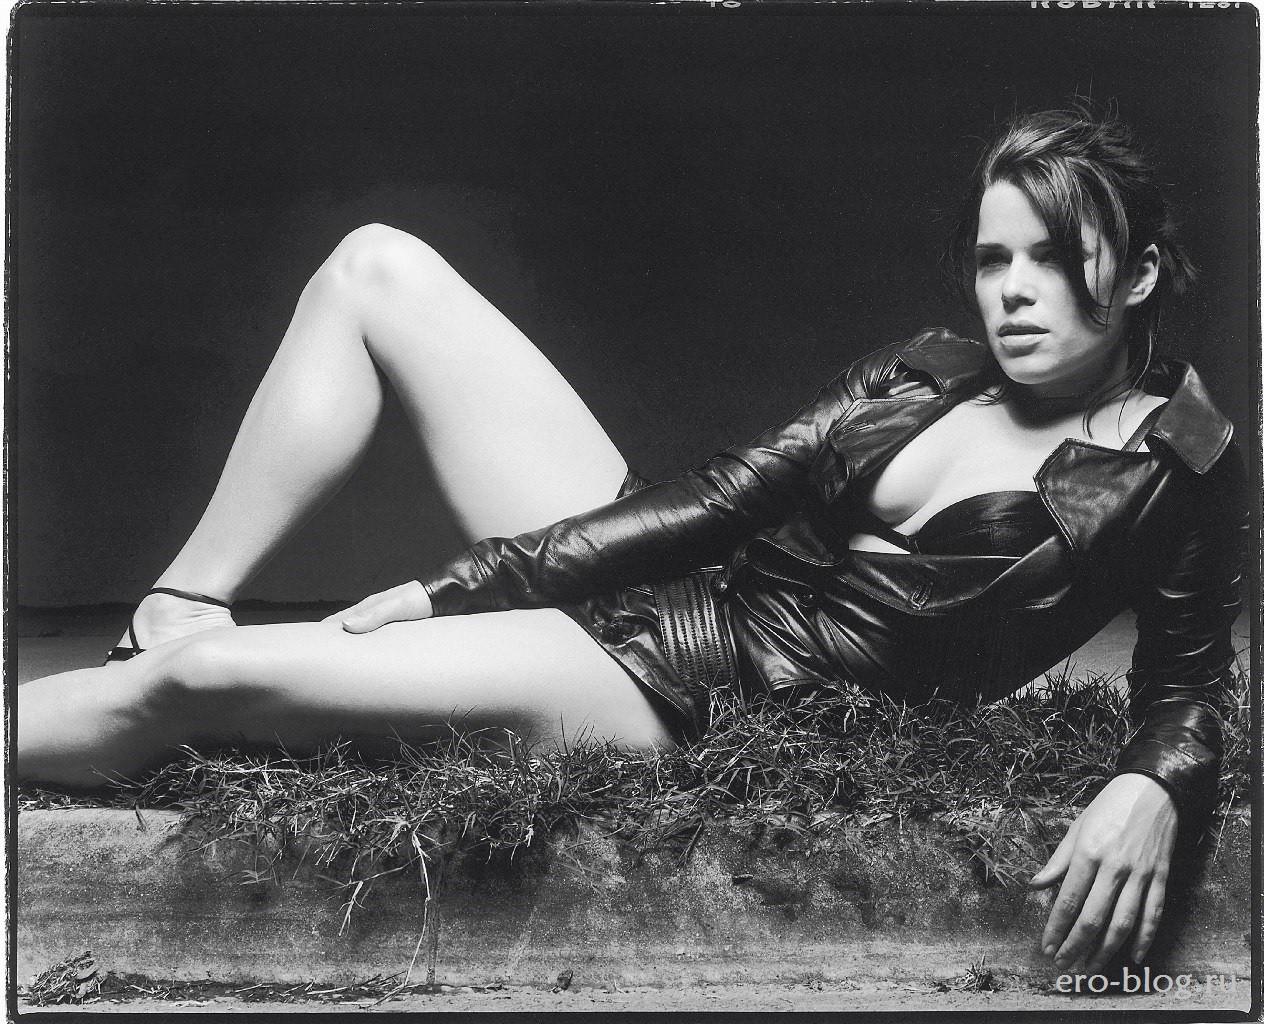 Голая обнаженная Neve Campbell | Нив Кэмпбелл интимные фото звезды